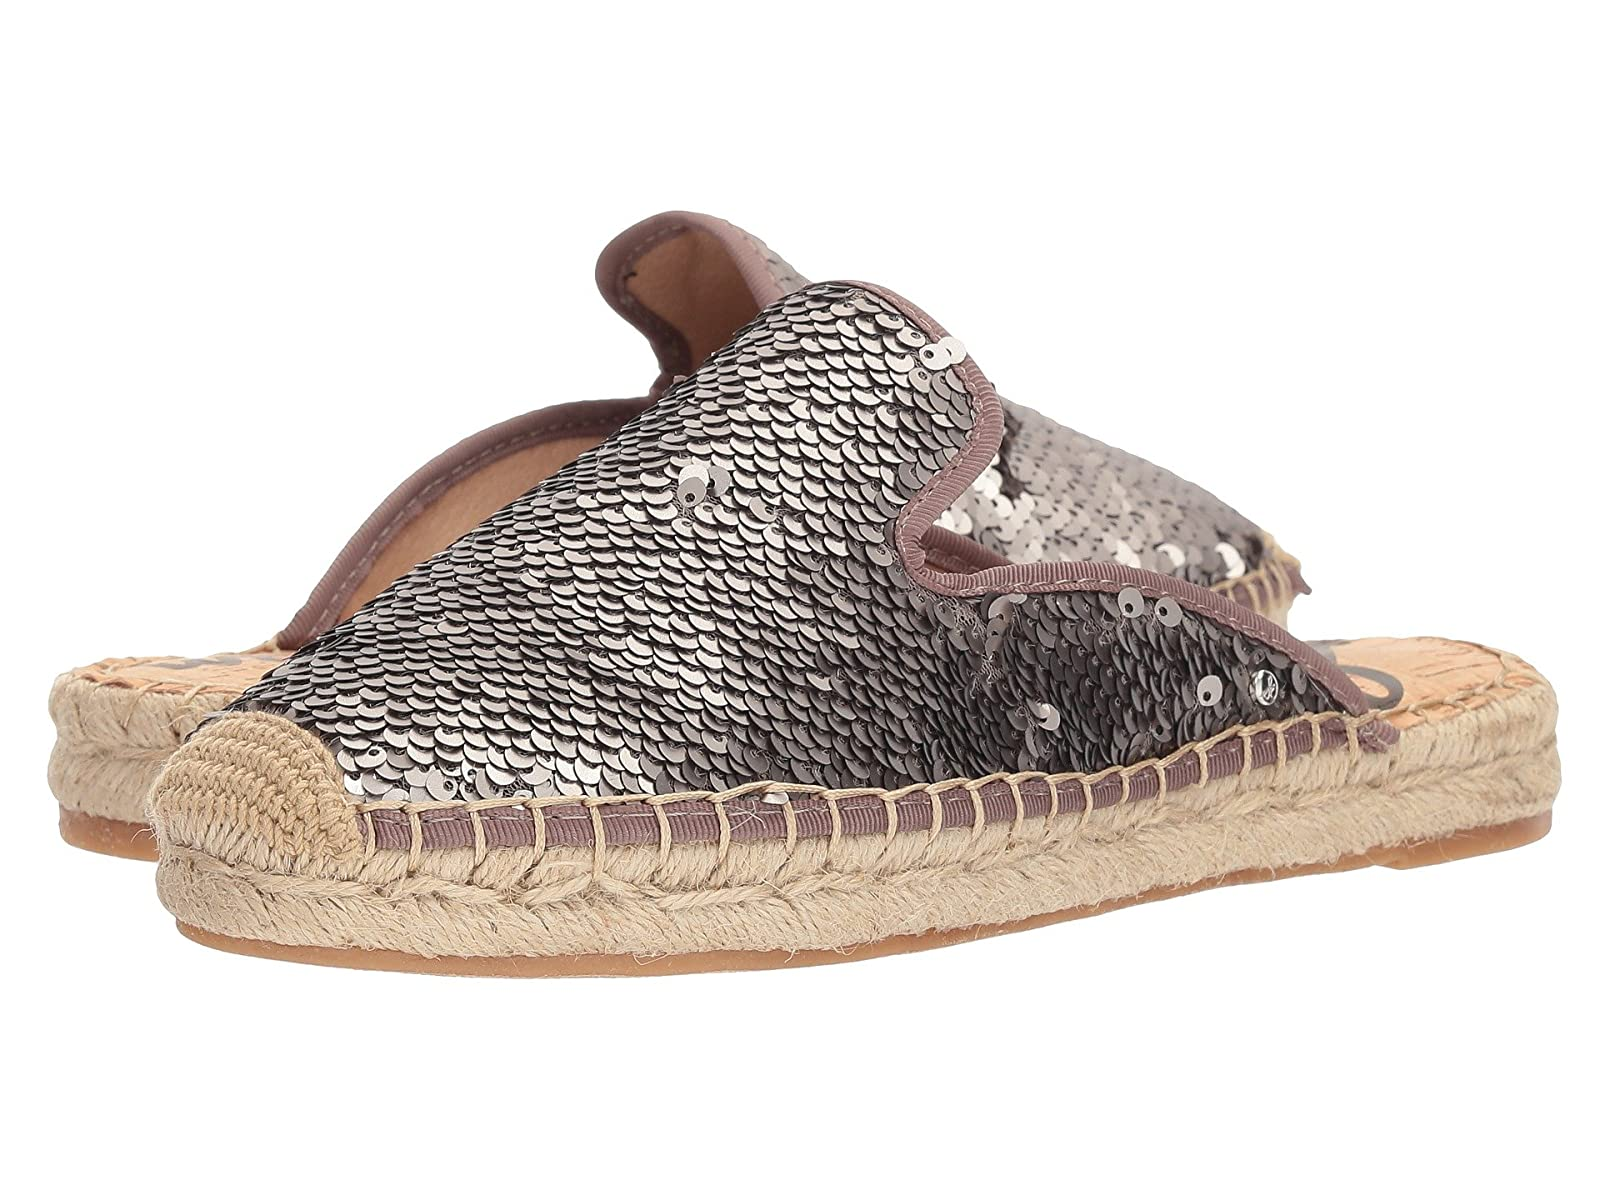 Sam Edelman KerryCheap and distinctive eye-catching shoes